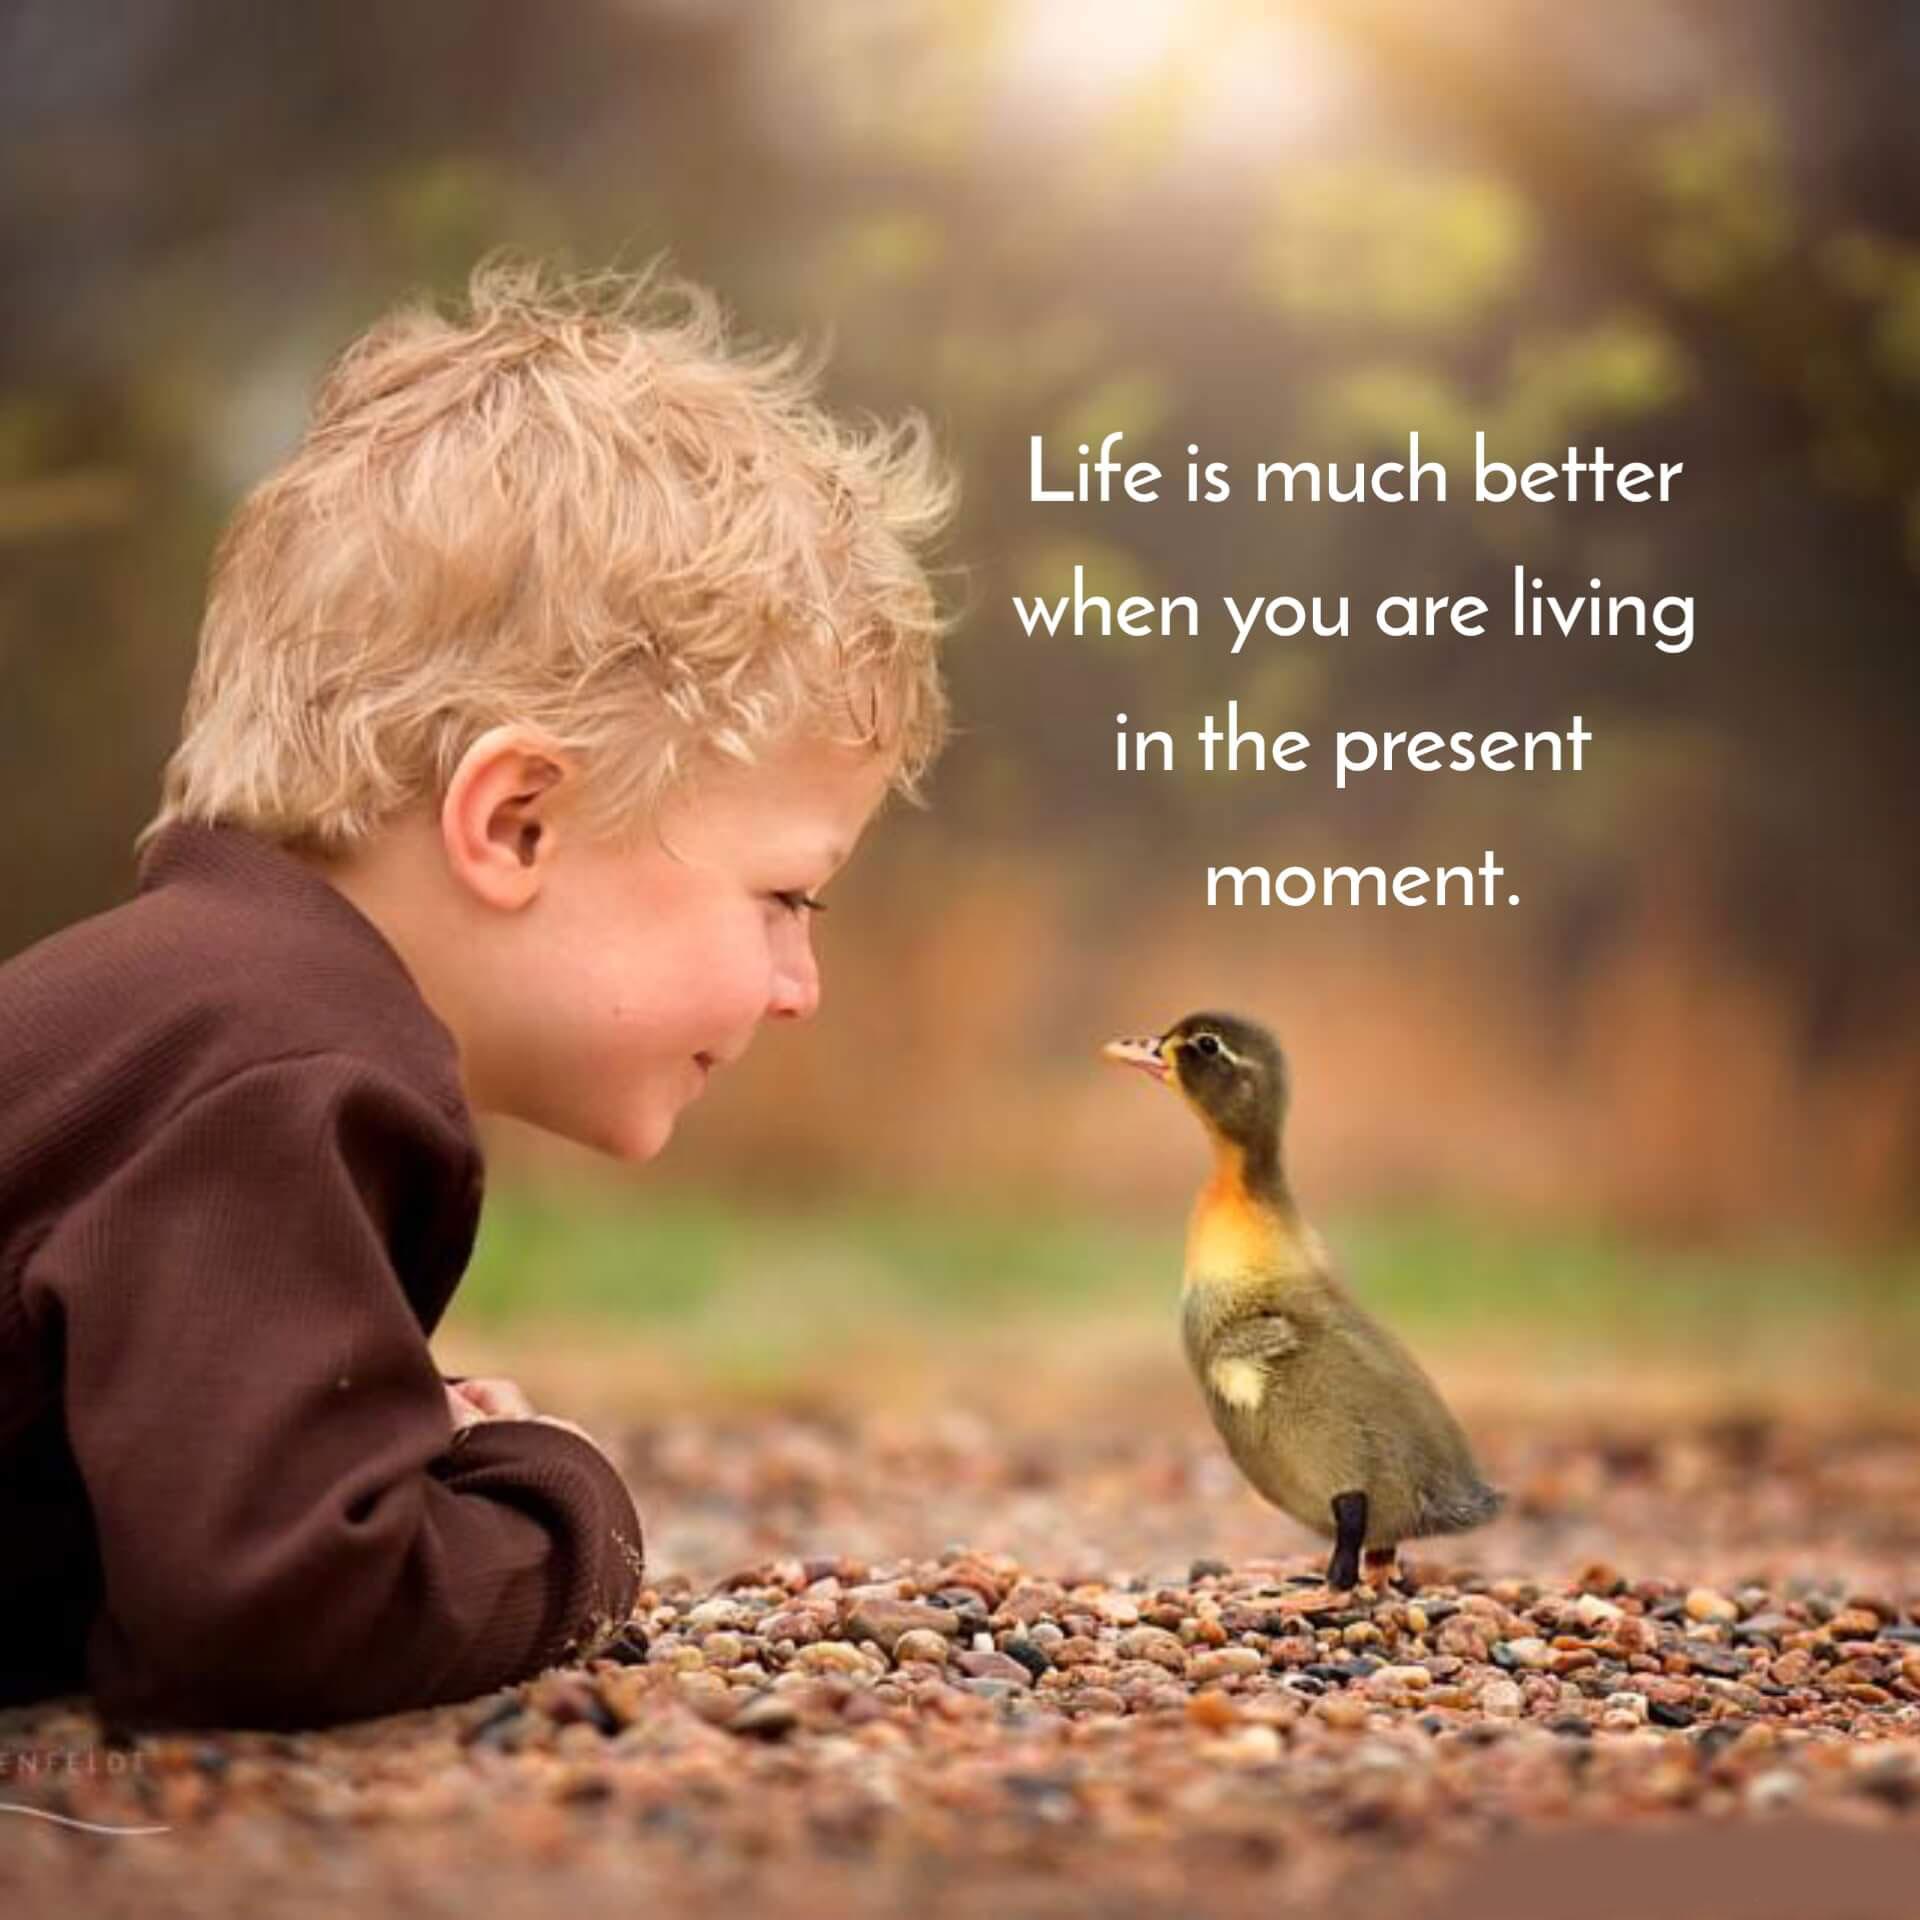 life quotes Latest Status Dp Images